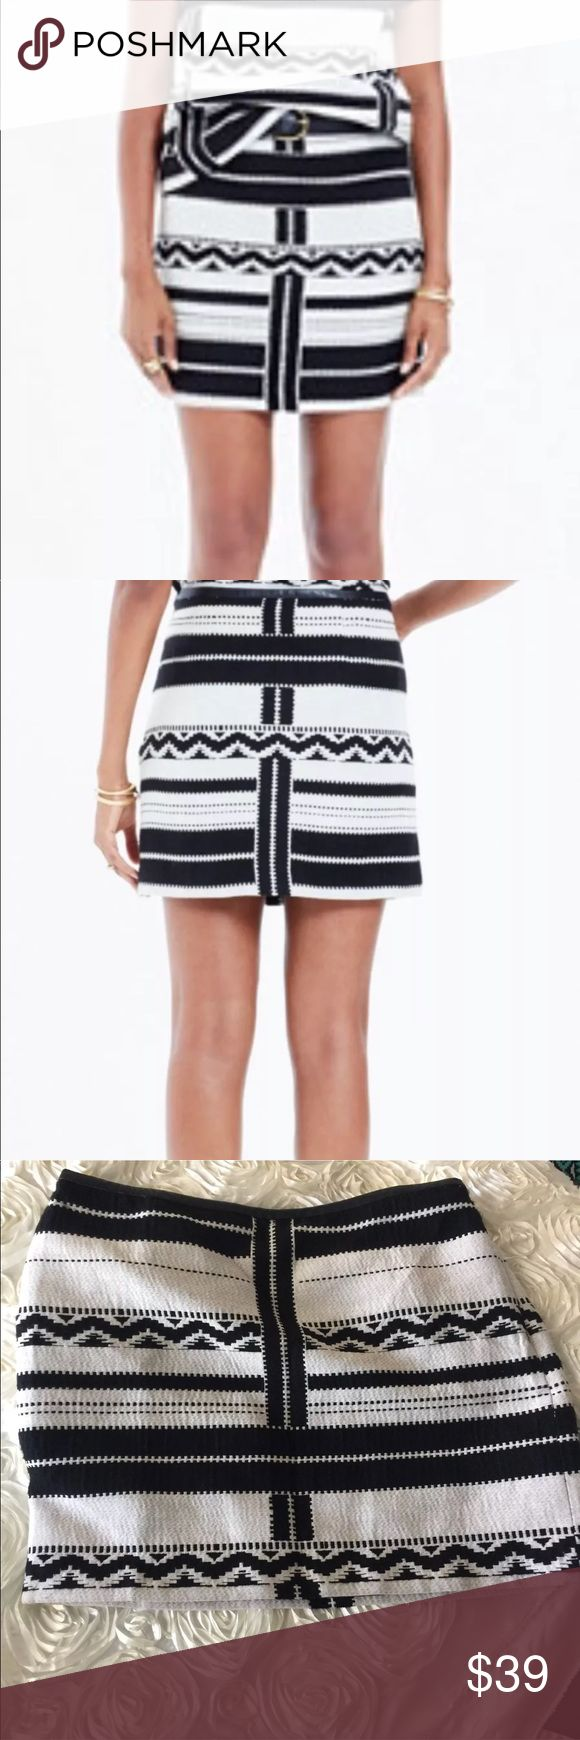 "NWT Madewell Gamine Jacquard Aztec Print  skirt 12 Madewell Skirt 12 Black Gamine Mini In Geo Jacquard Aztec Print. M48 A bit if pulling. NWT flat lay measurements waist--17"" hips--20 1/4"" length--16.5"" Madewell Skirts Mini"